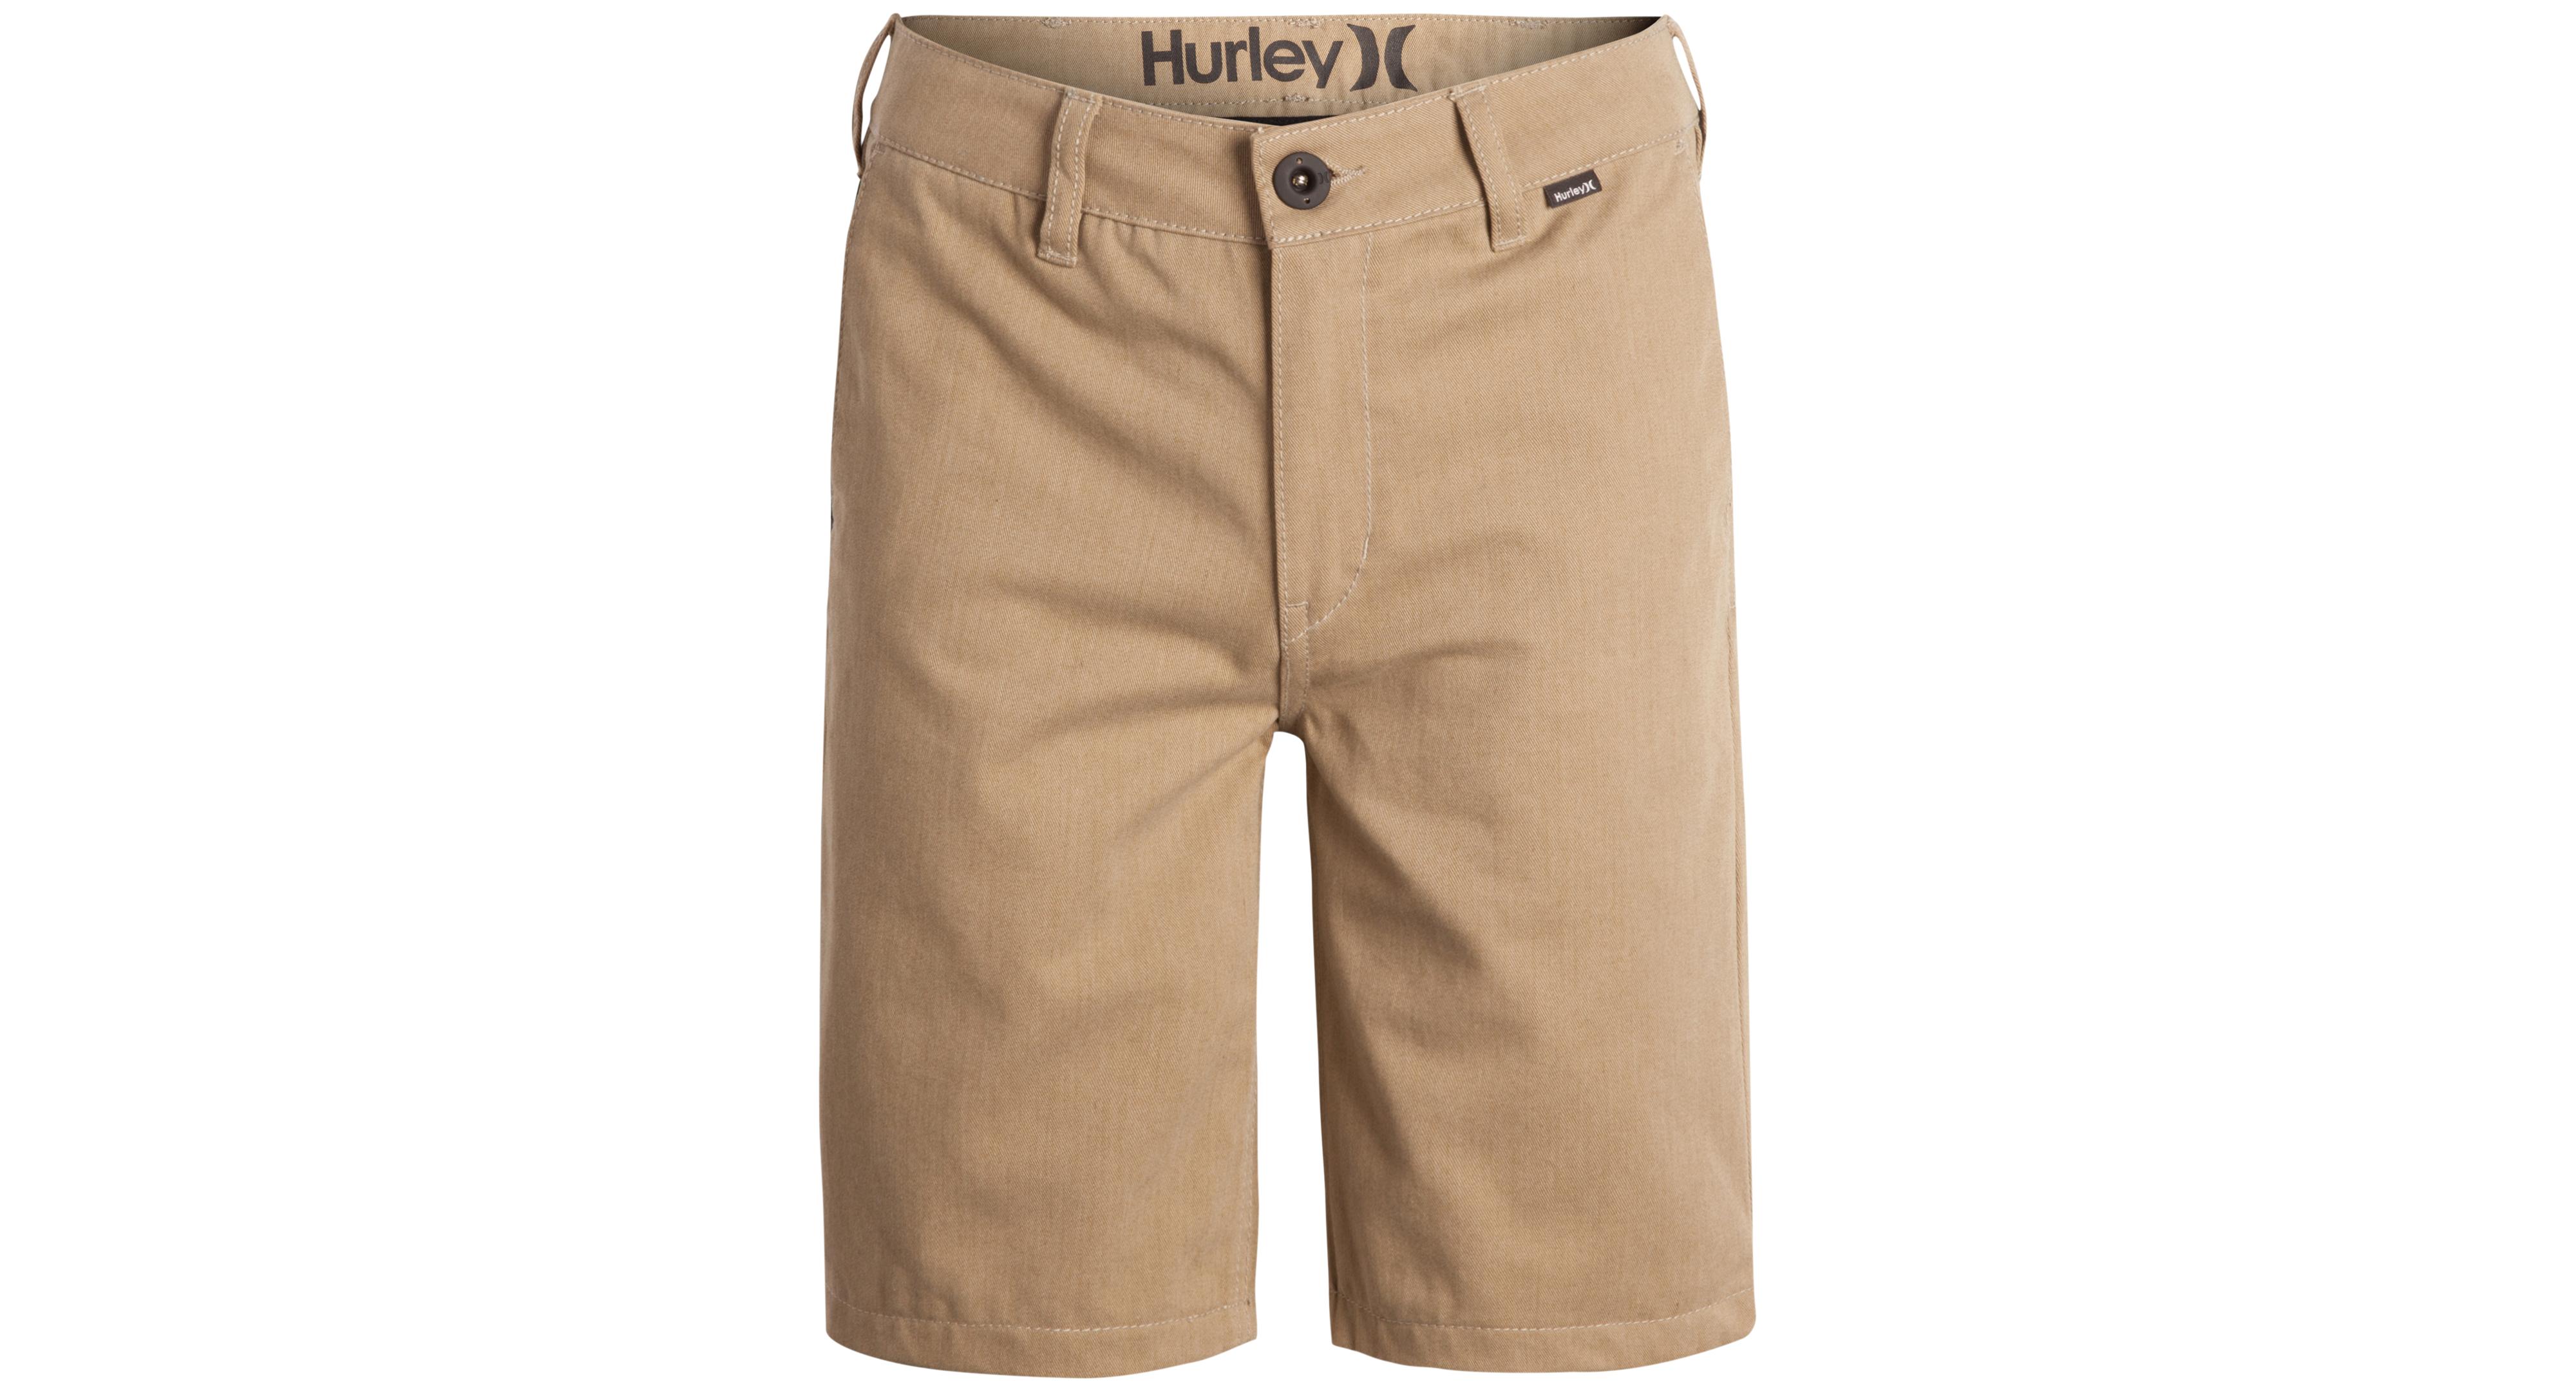 Hurley Boys' One & Only Walkshorts